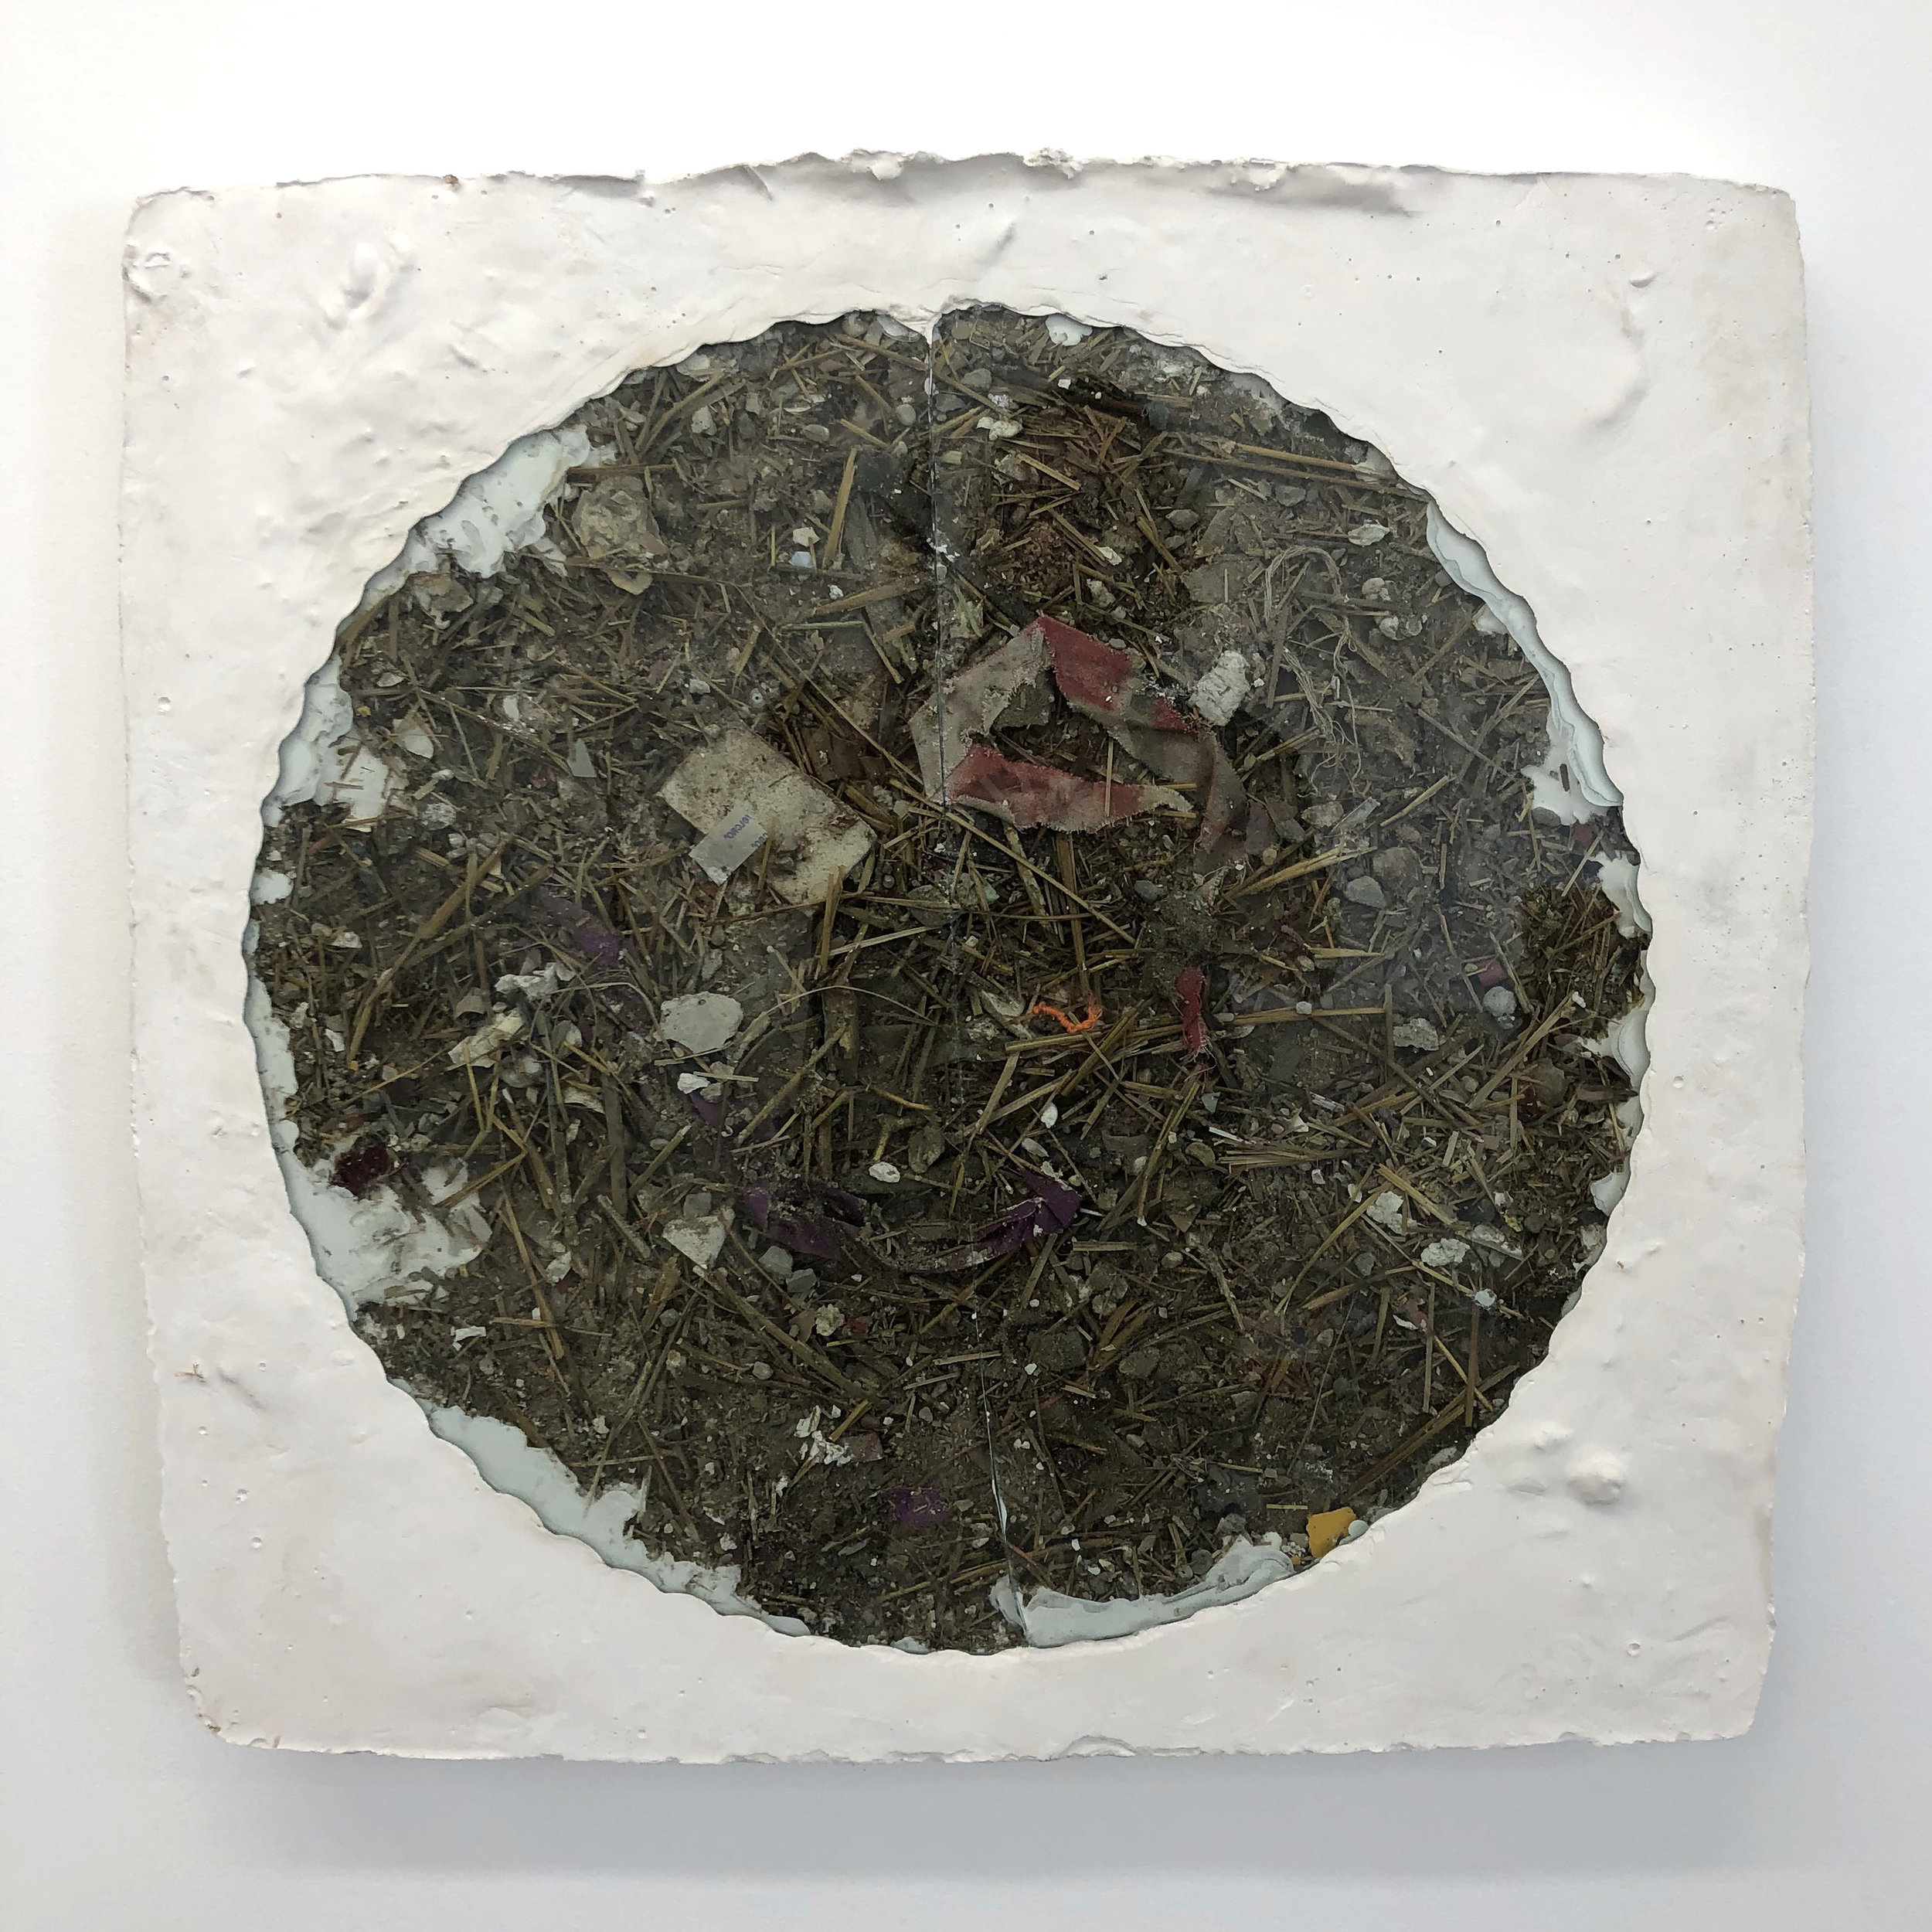 Medallion , 2018 Hydrocal, studios debris, glass table top 28 x 28 x 2-1⁄2 in